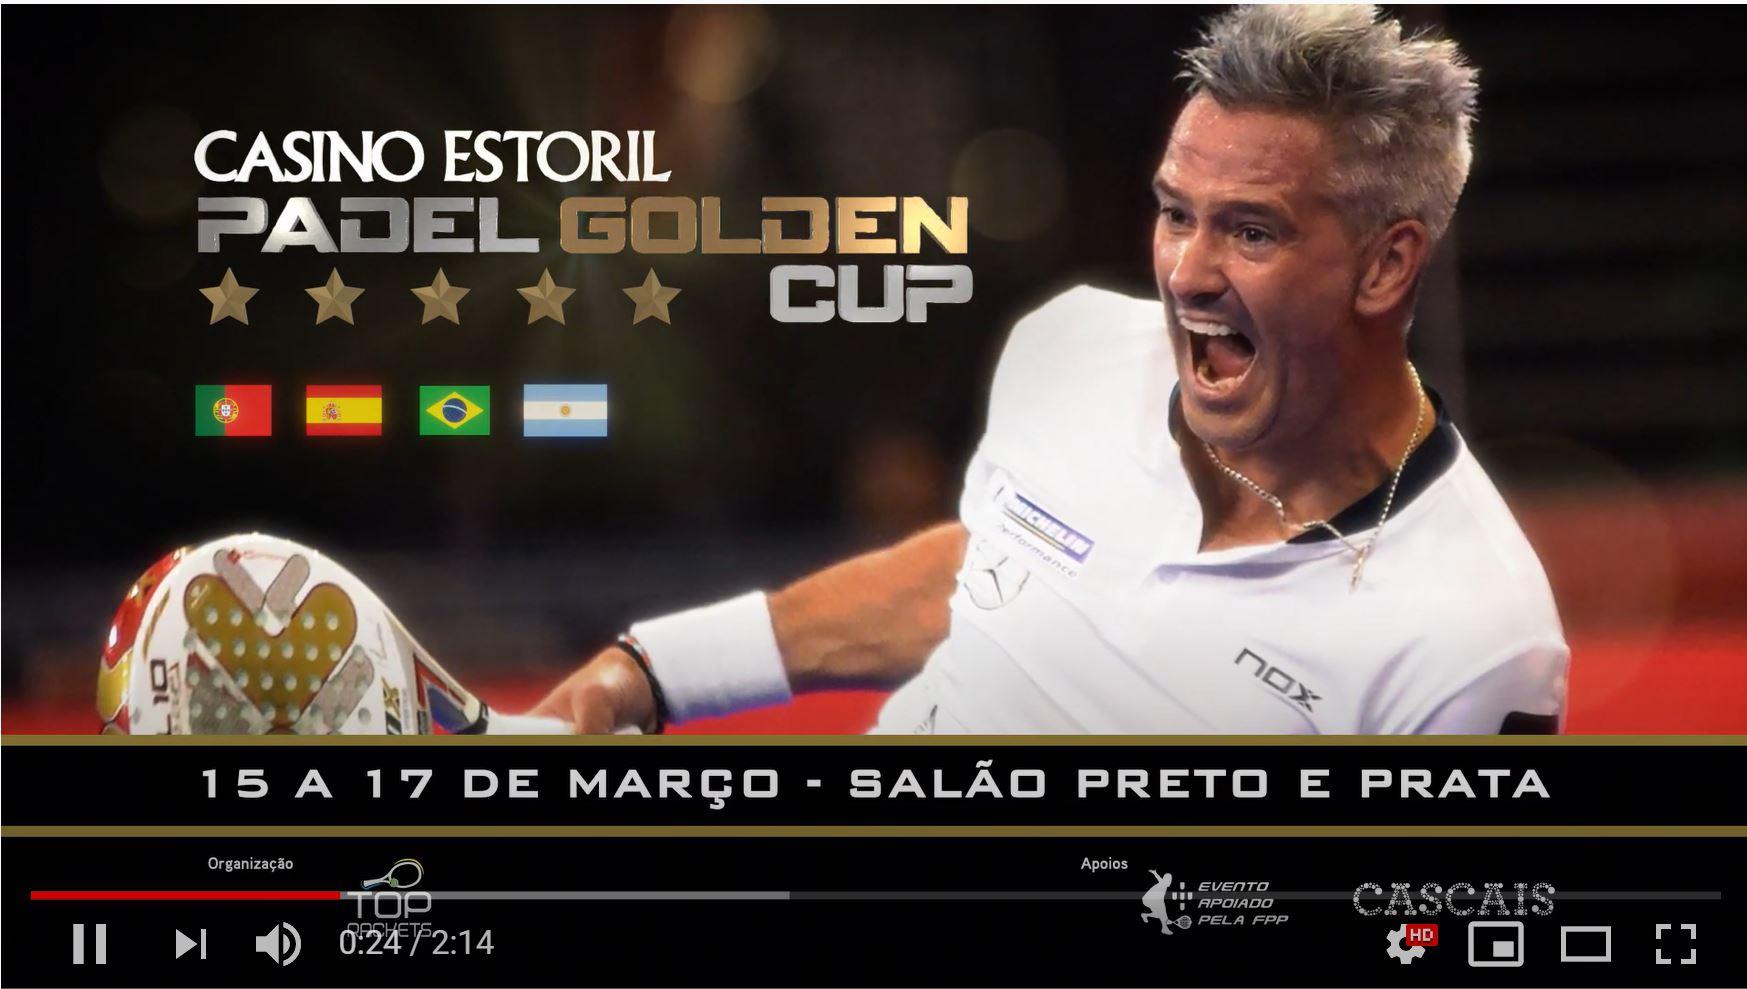 CASINO ESTORIL GOLDEN CUP